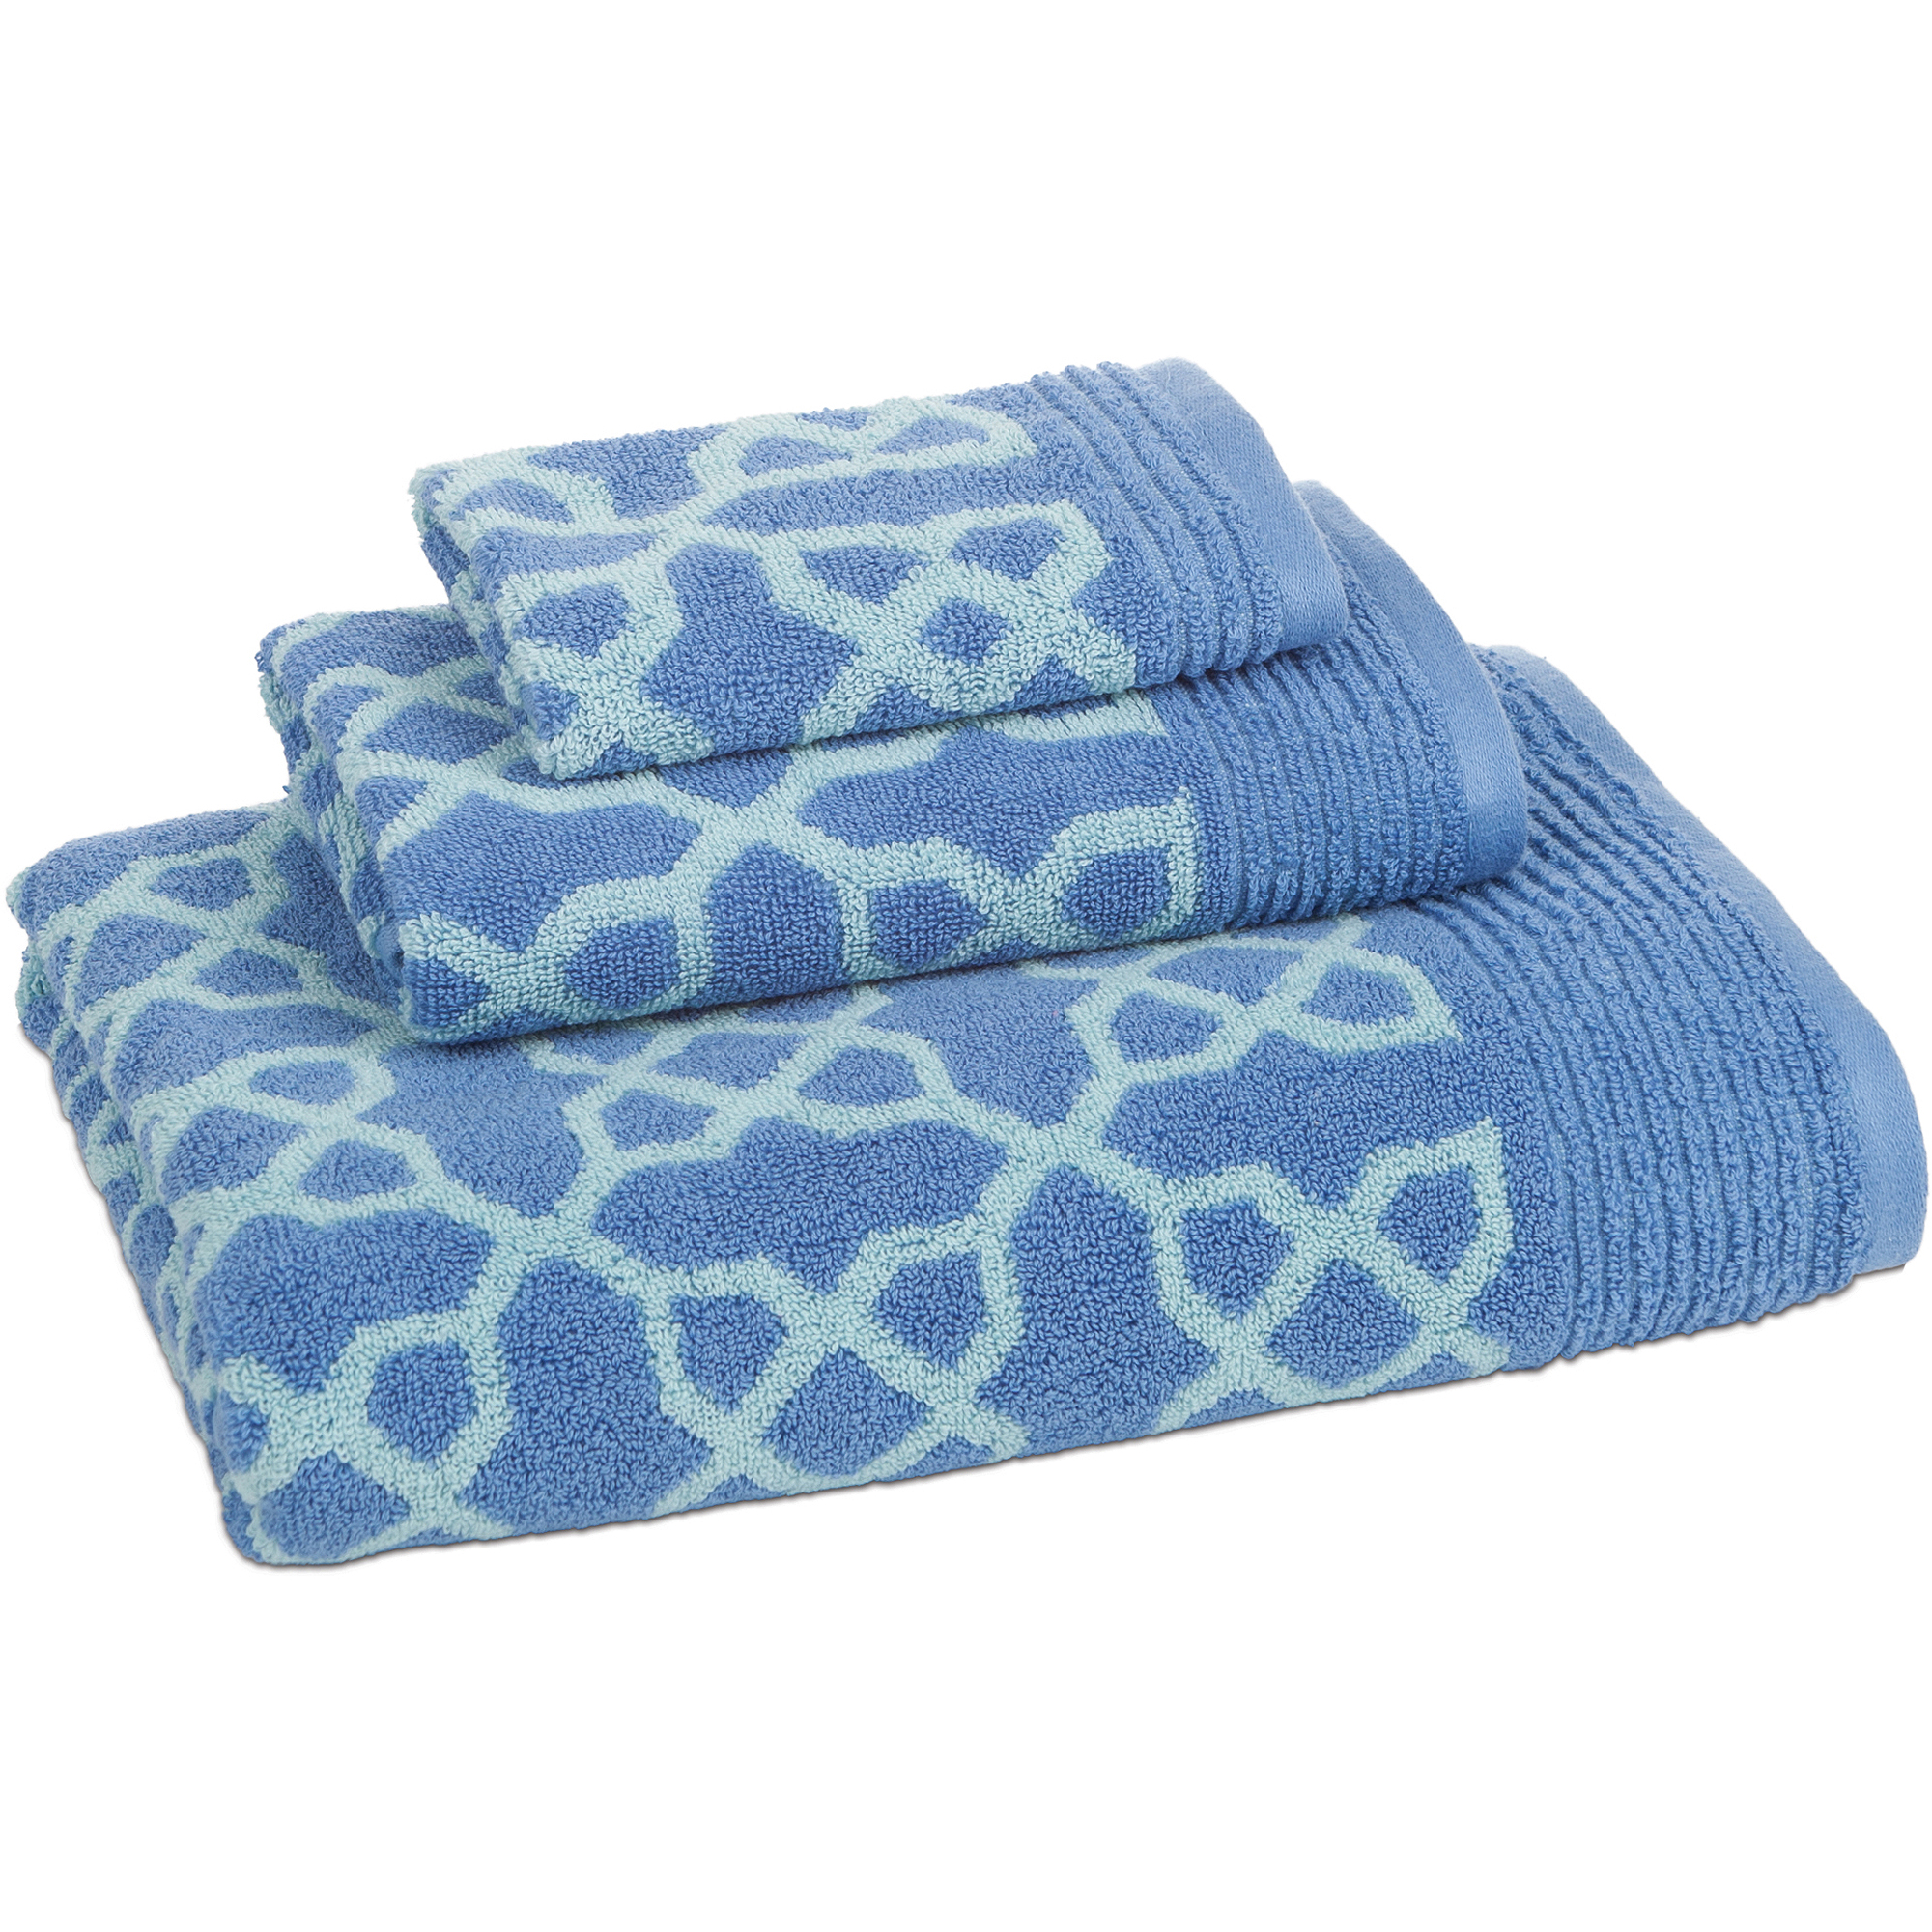 Links 3-Piece Bath Towel Set